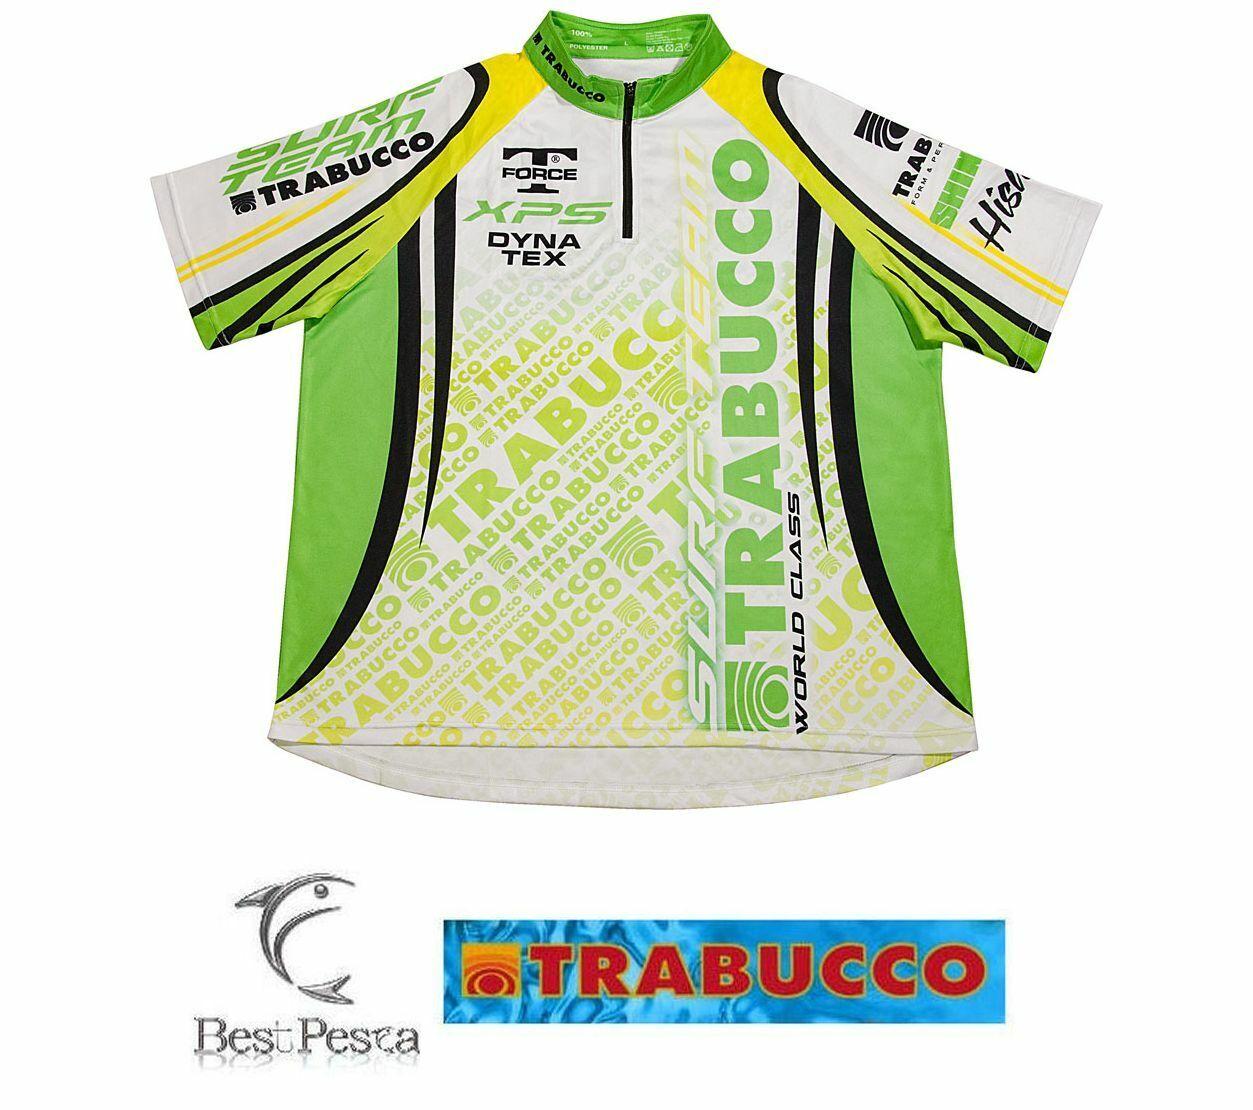 Trabucco Surf Team Shirt Short Sleeve-Size XL-Code 040-91-300